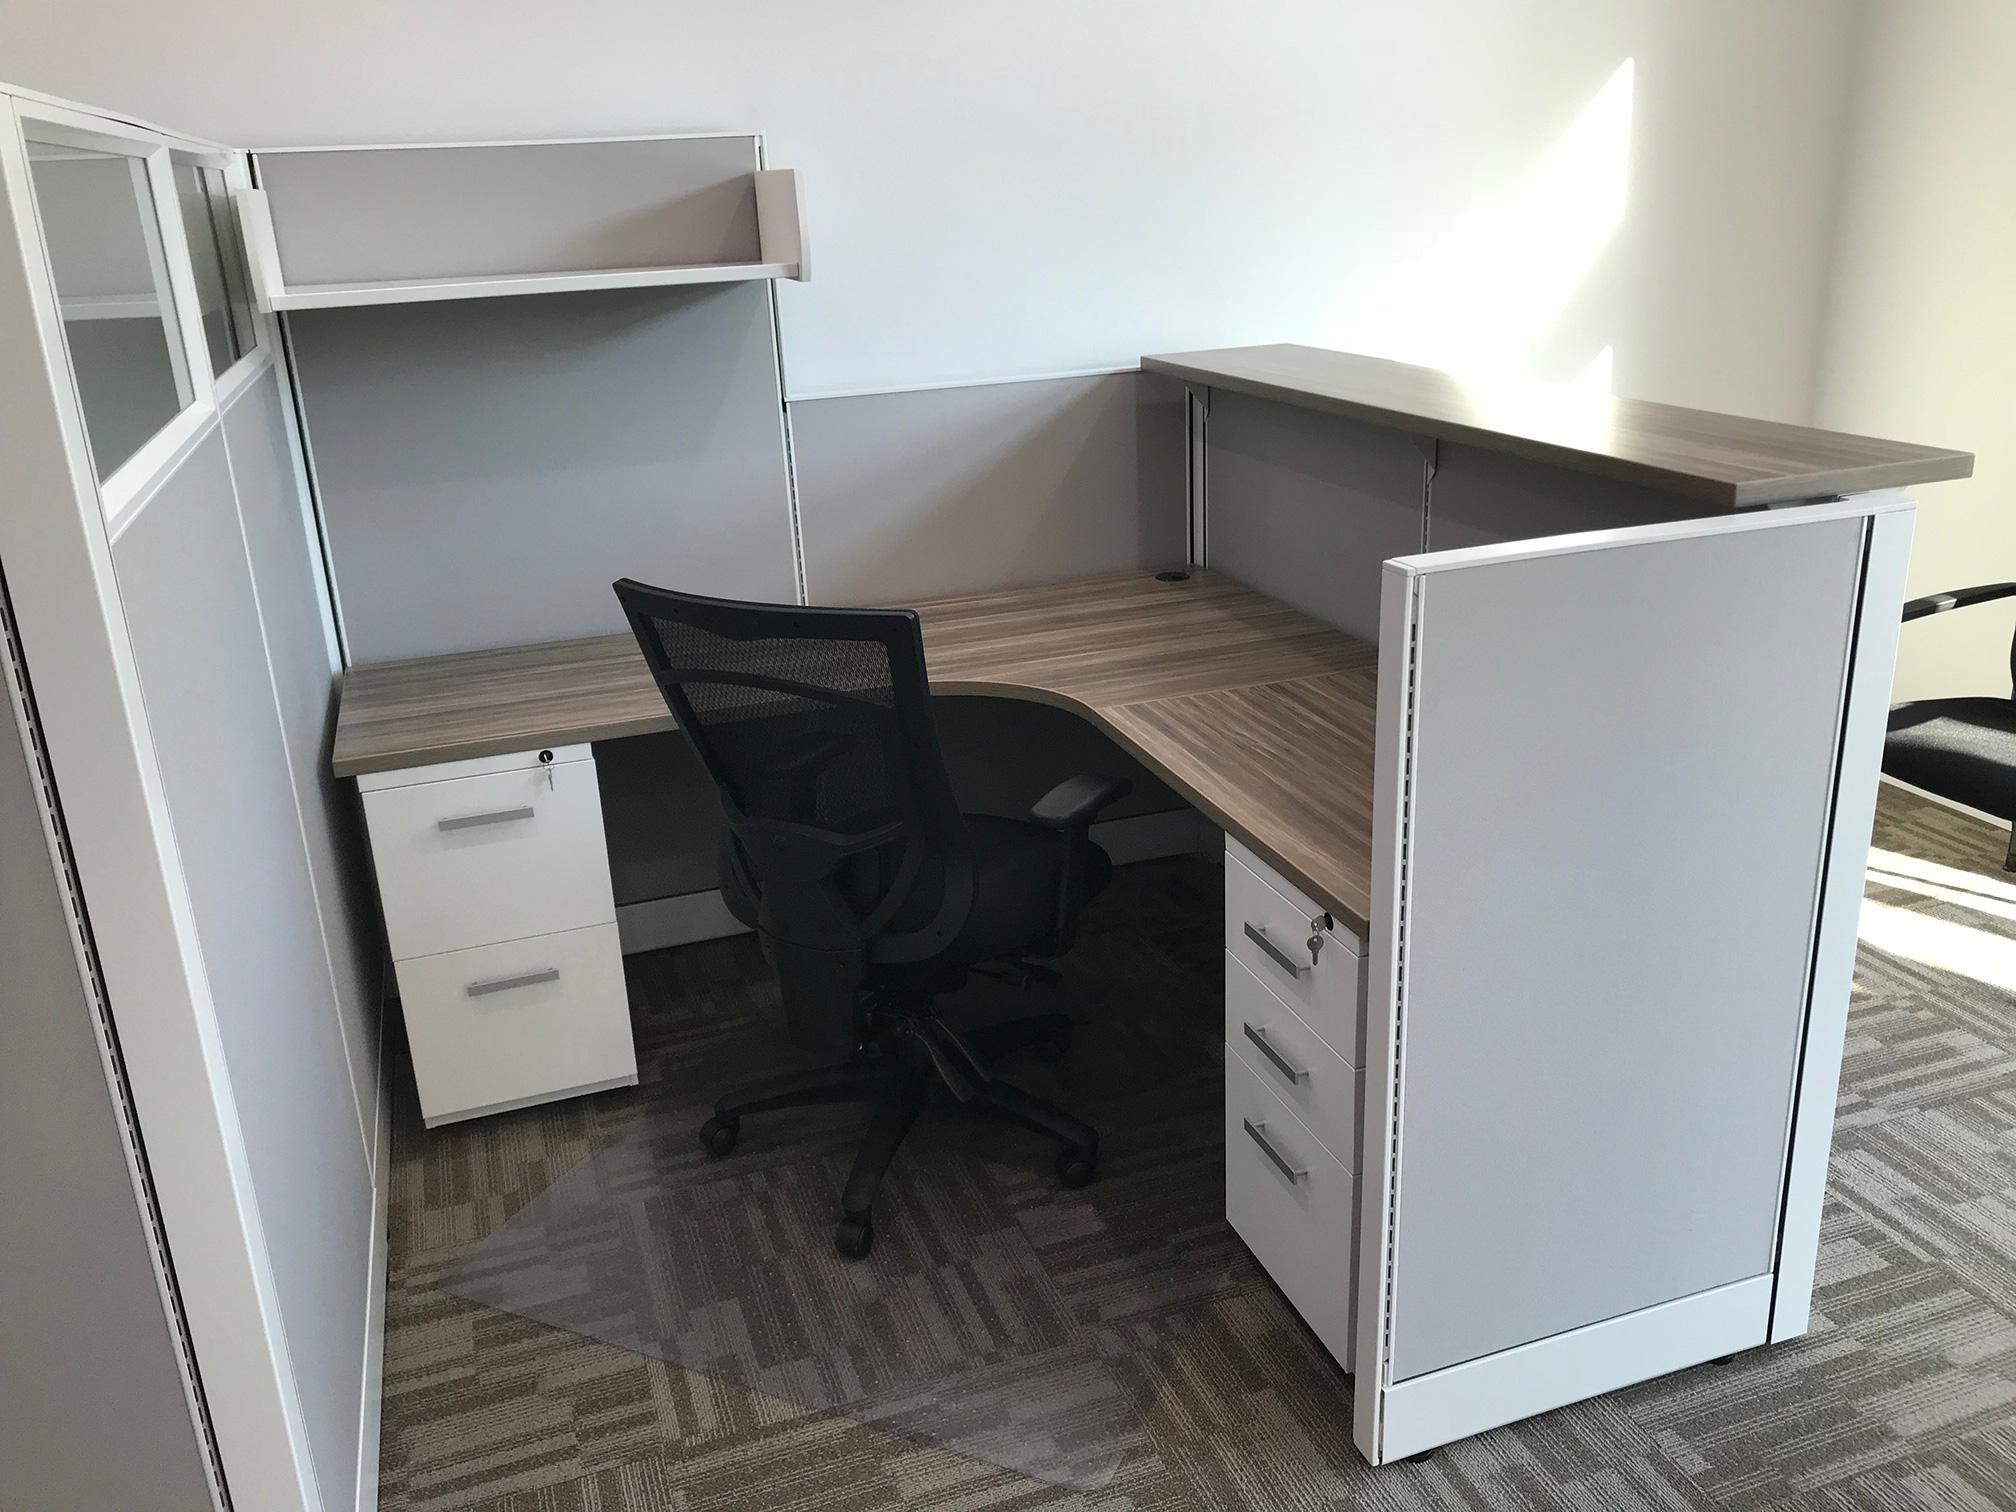 metal-cubicle-storage-manasota-office-supplies-llc.jpg